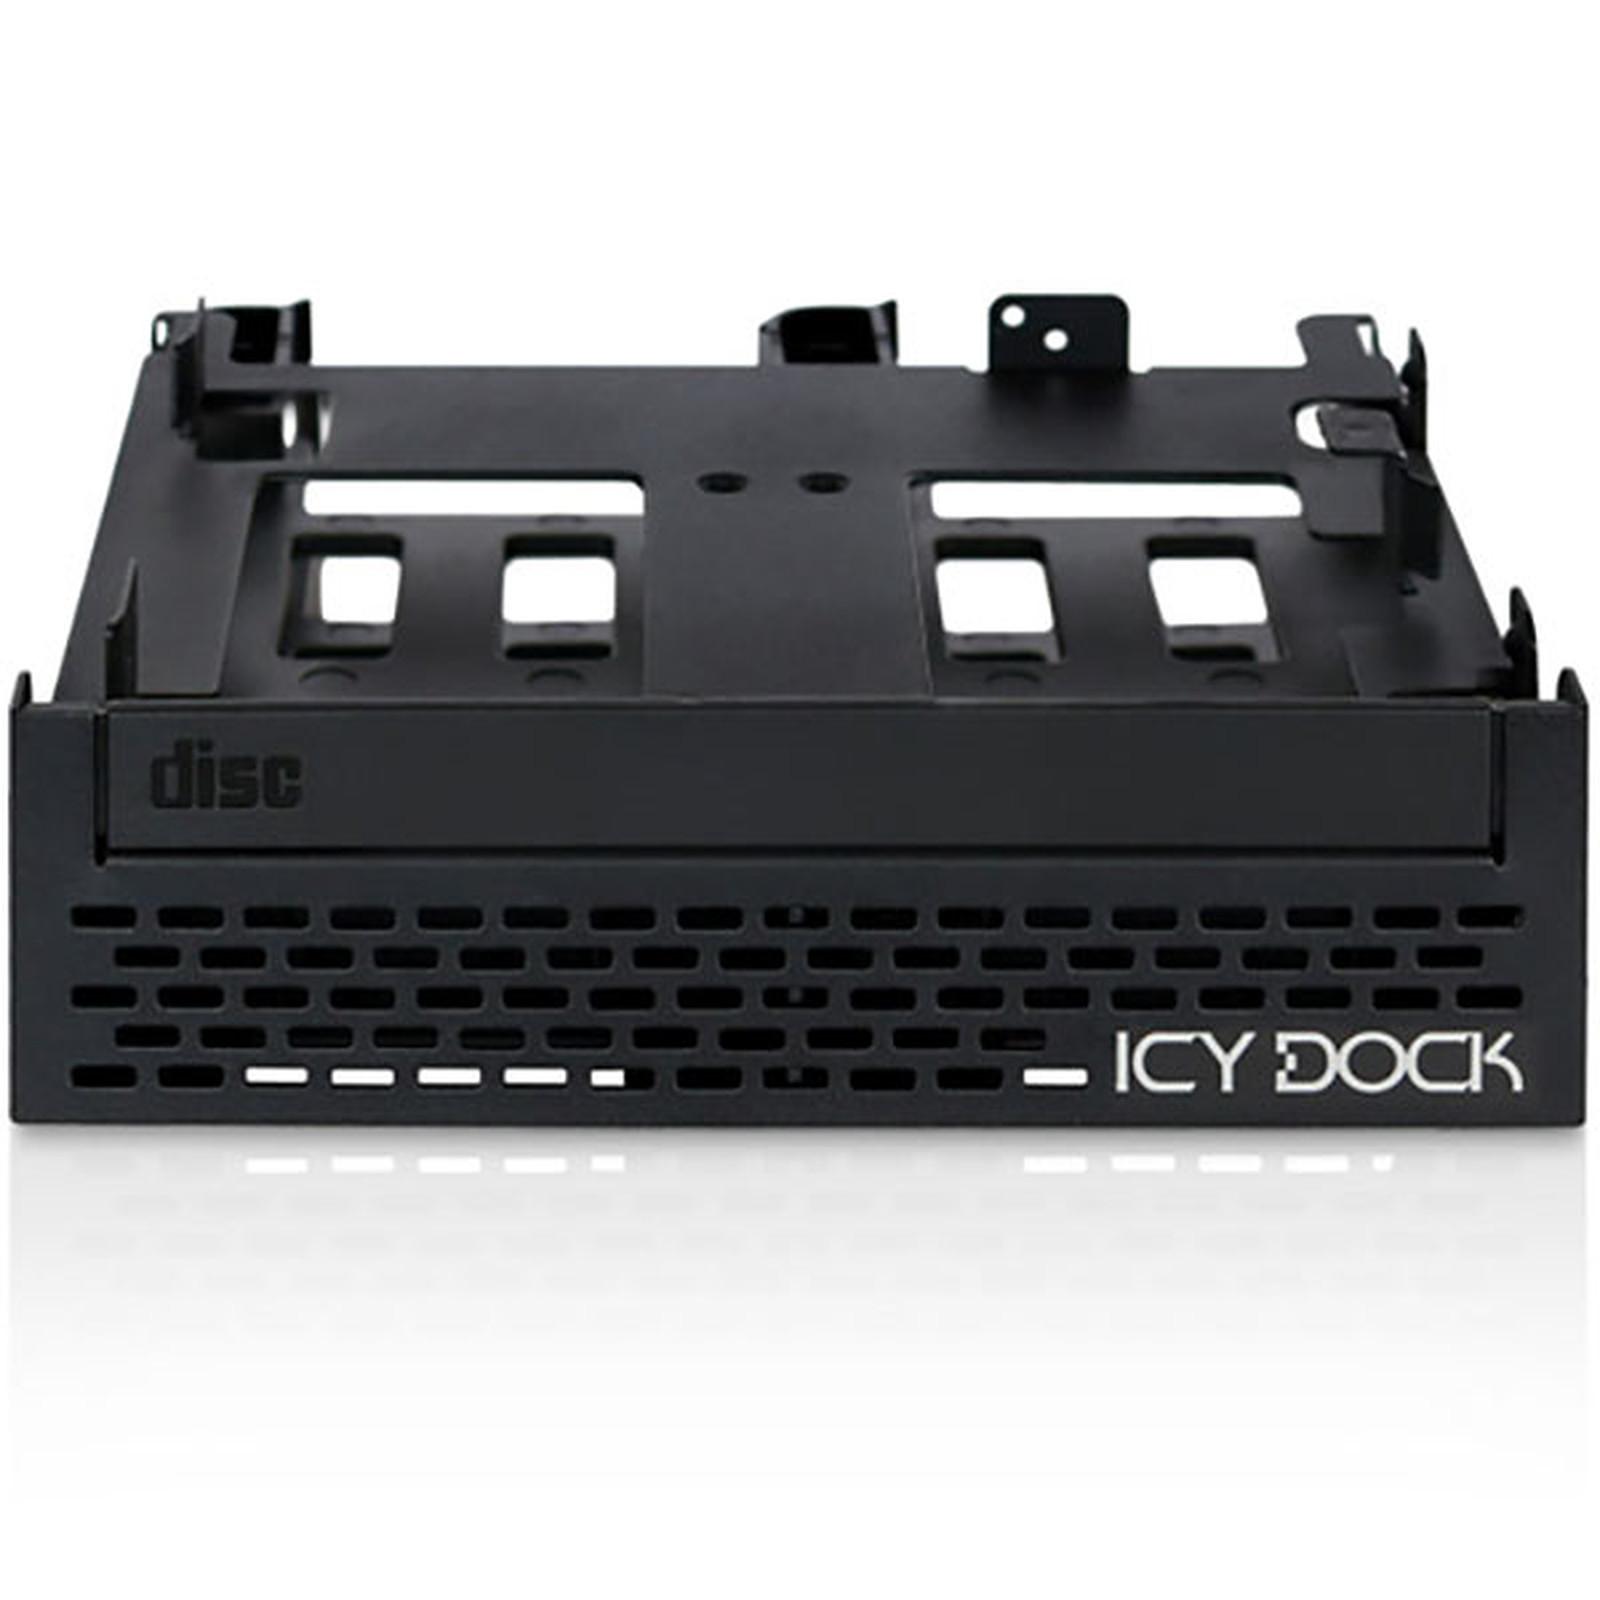 ICY DOCK Flex-Fit Quinto MB344SPO